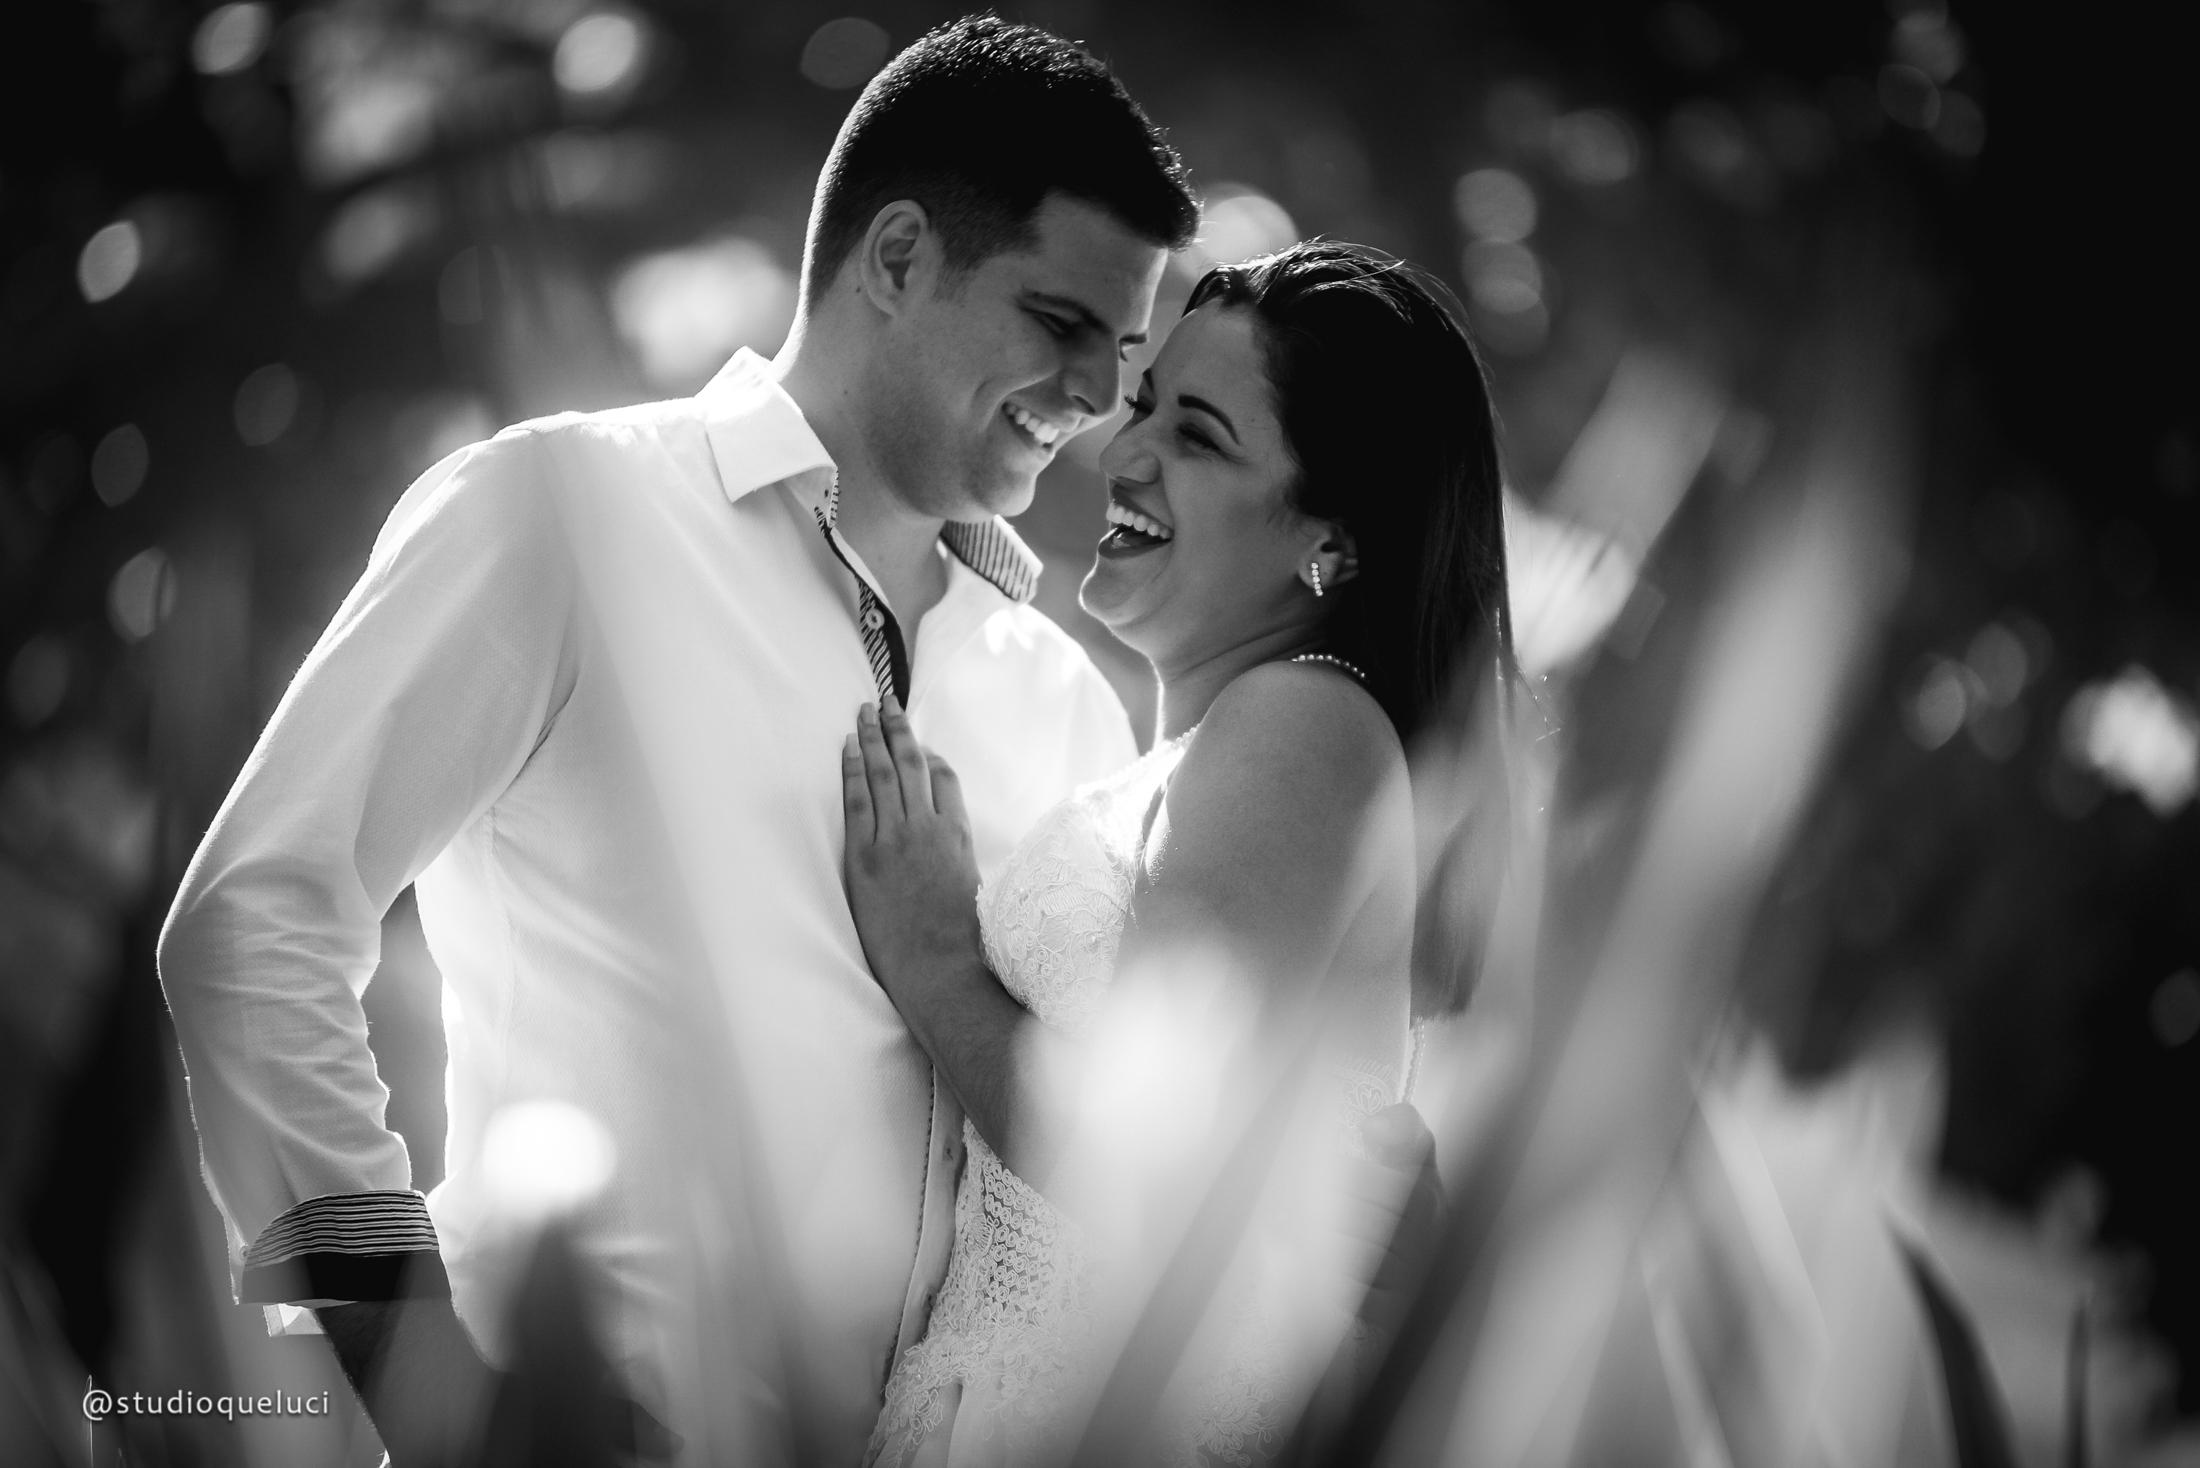 fotografia de casamento ensaio pre wedding (8)